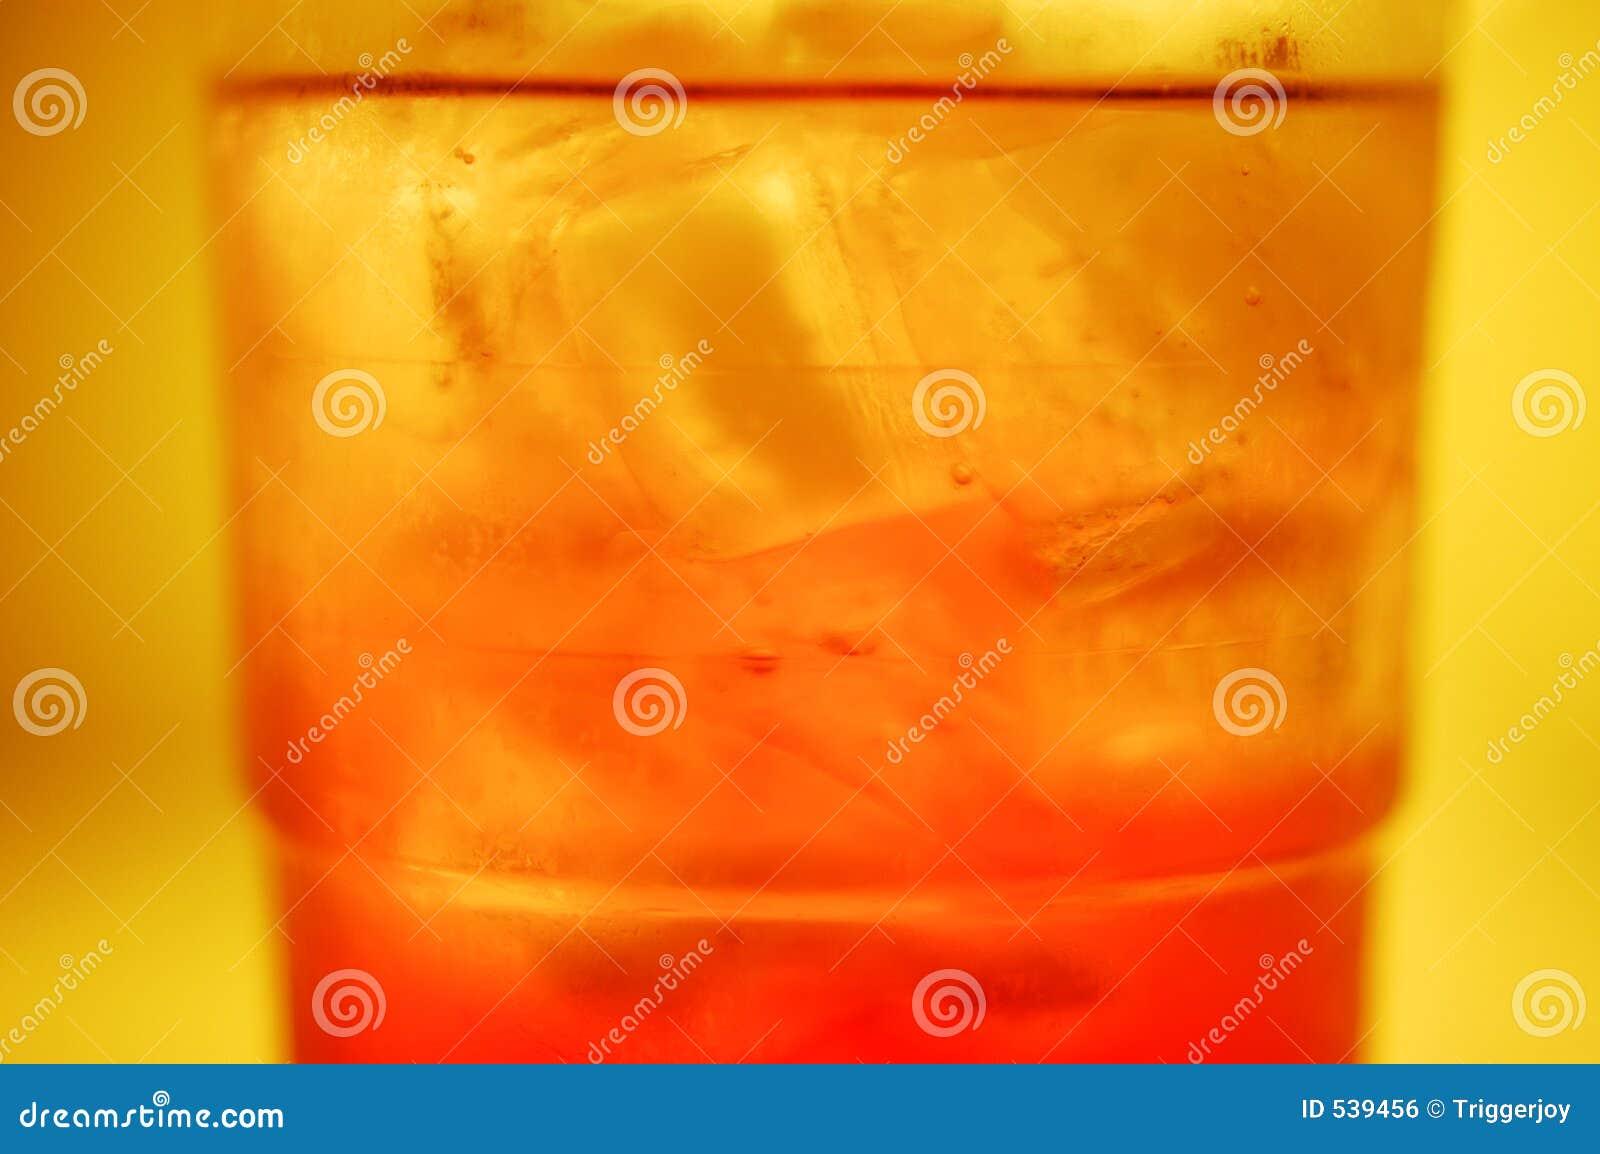 Download 晴朗冷静的日 库存照片. 图片 包括有 干渴, 熄灭, 潮湿, 玻璃, 冷却, 致冷机, 晴朗, 冷静 - 539456